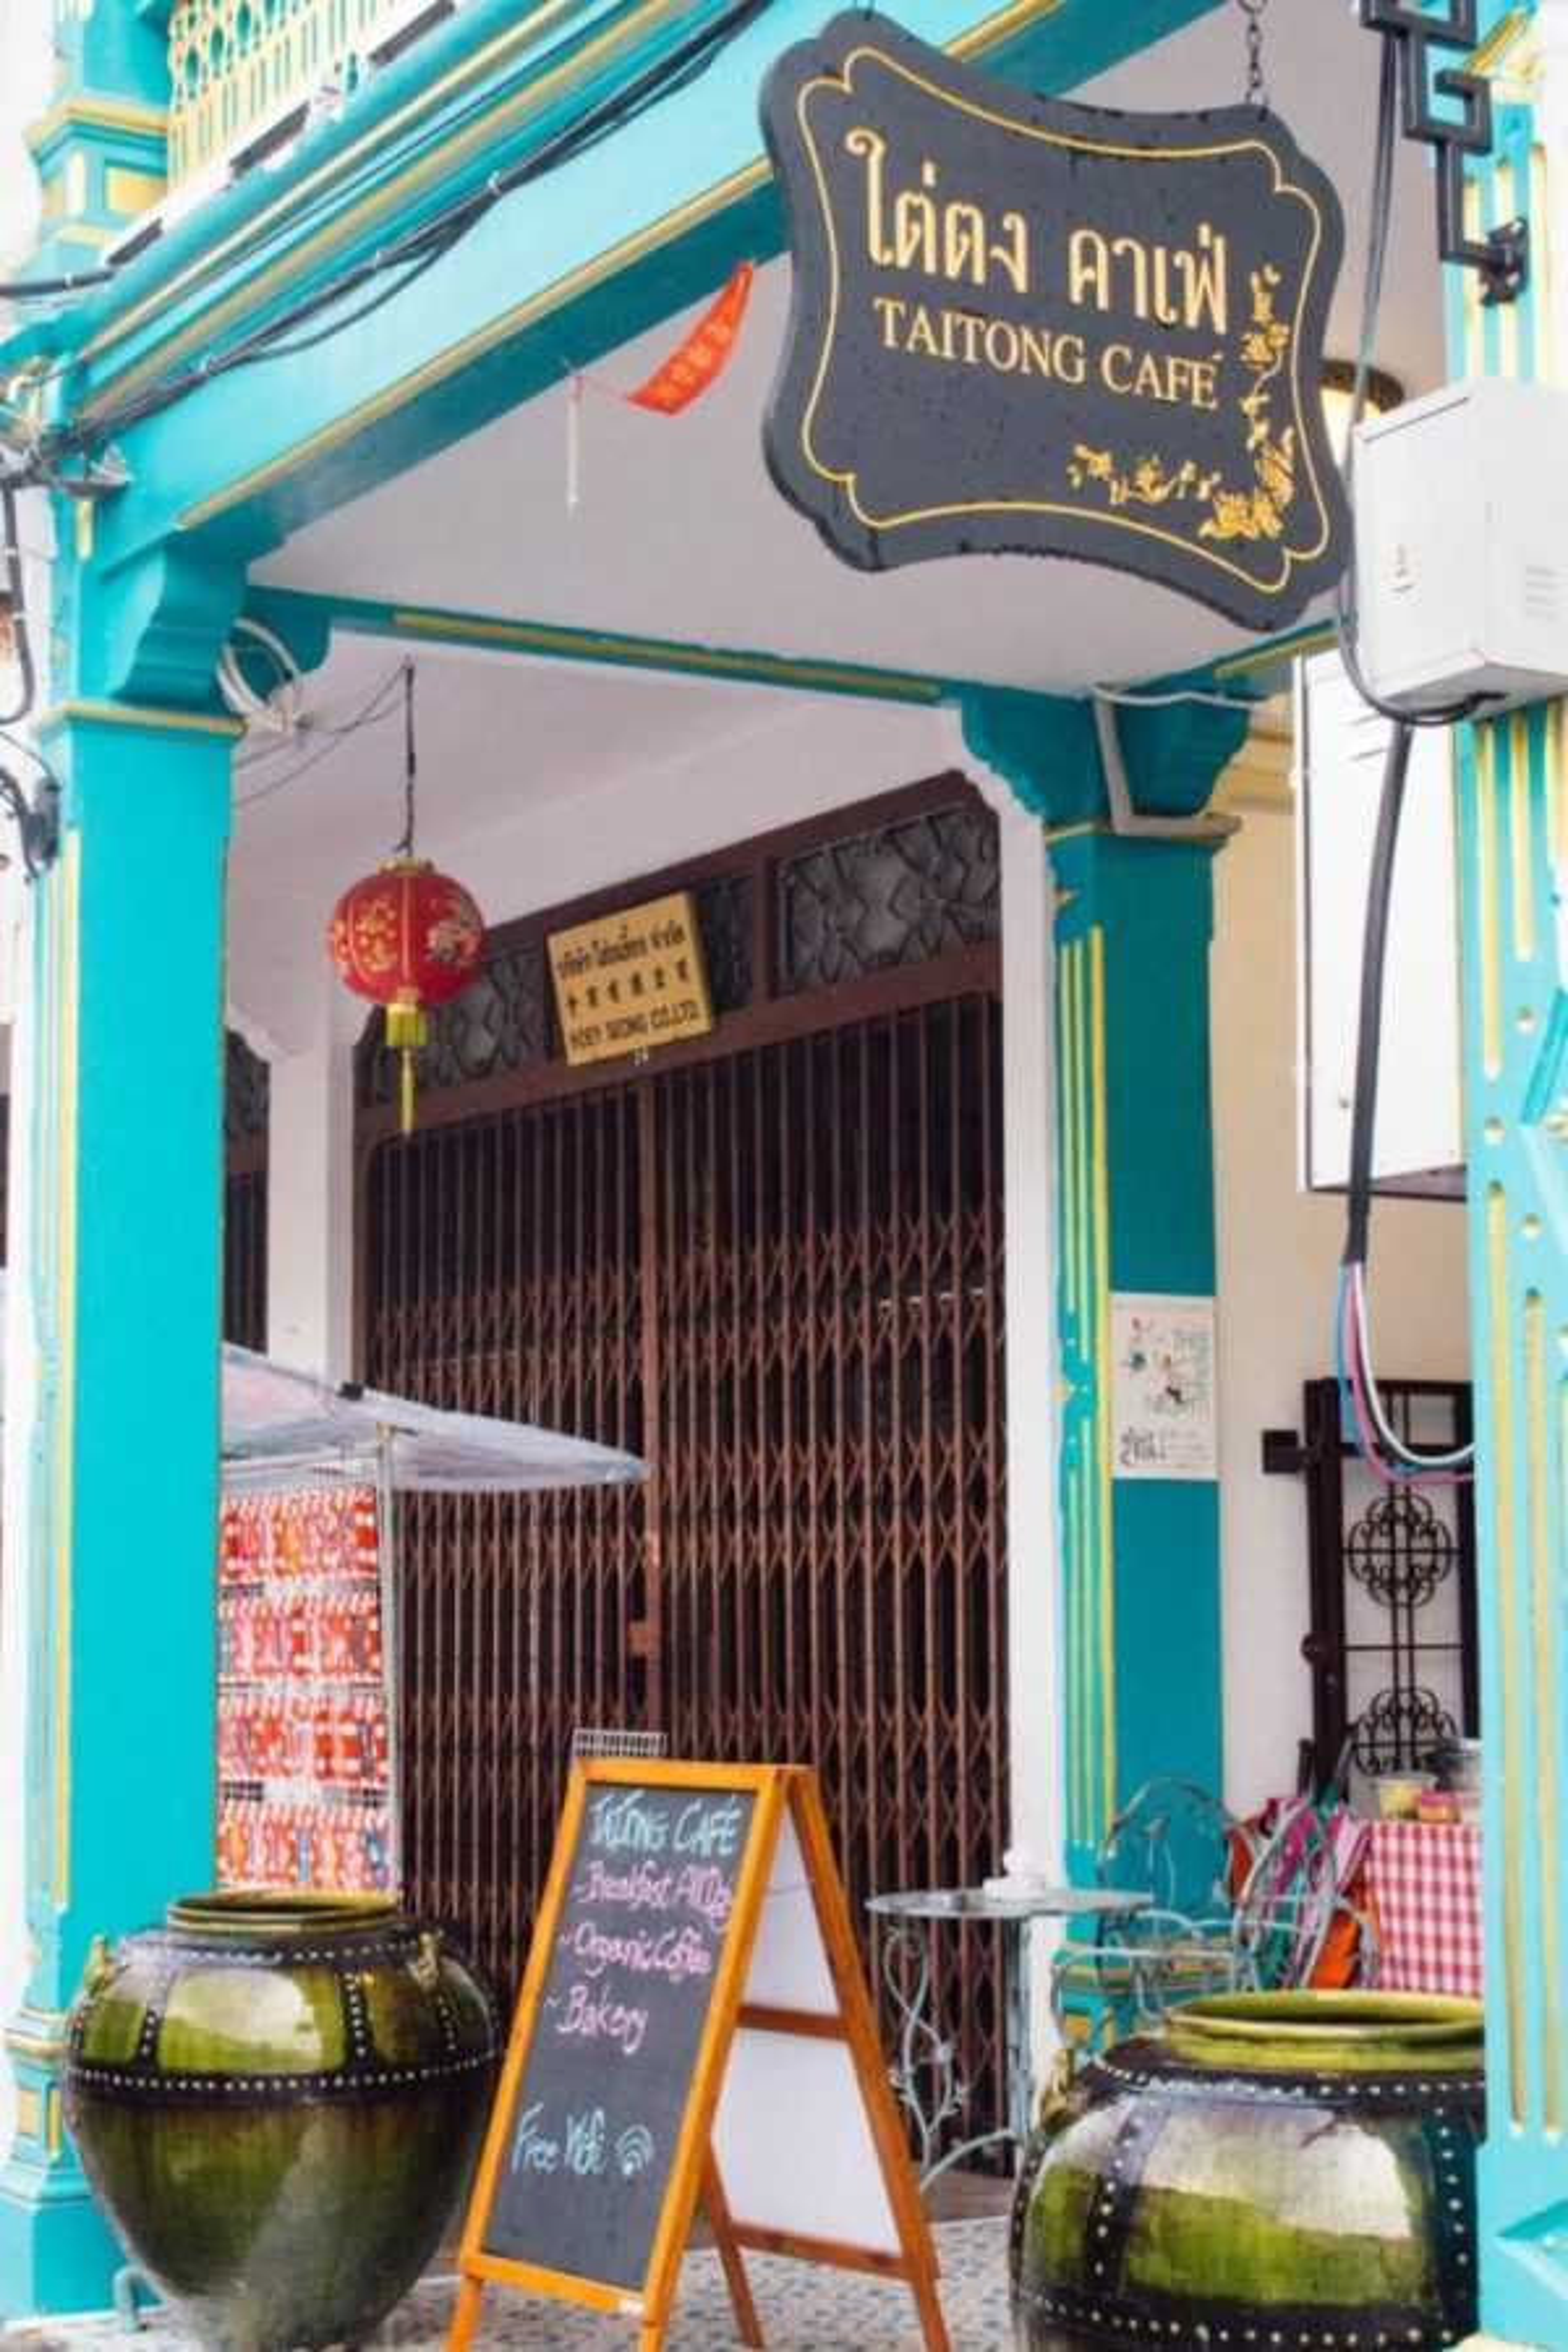 Phuket Stadt Thailand Taitong Café